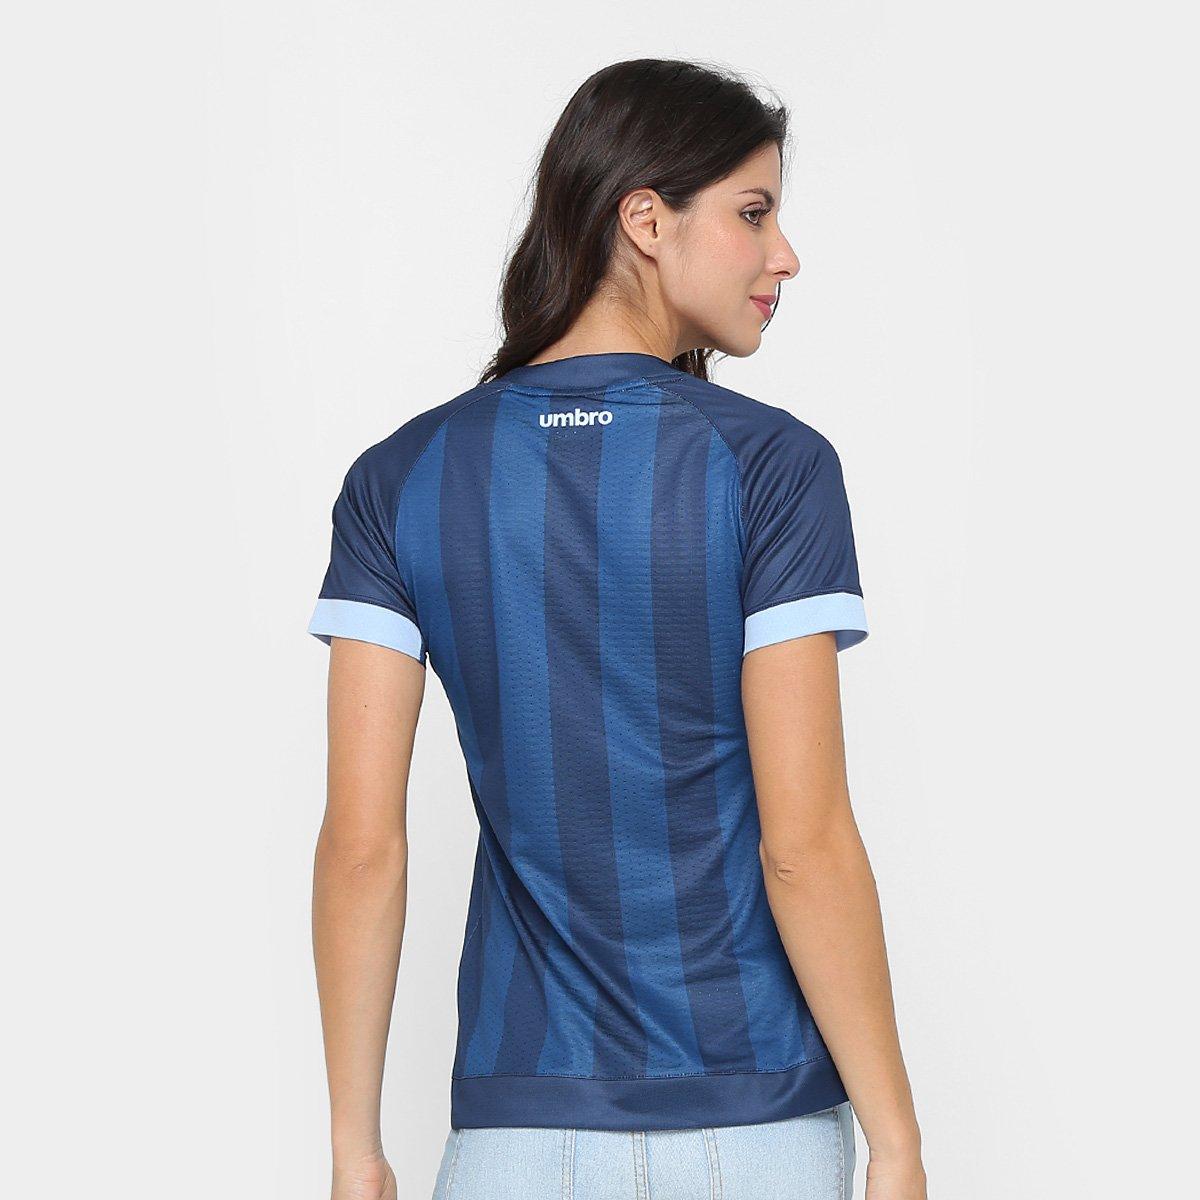 Camisa Grêmio III 17 18 s n° - Torcedor Umbro Feminina - Marinho ... a5d3c275eb0d8